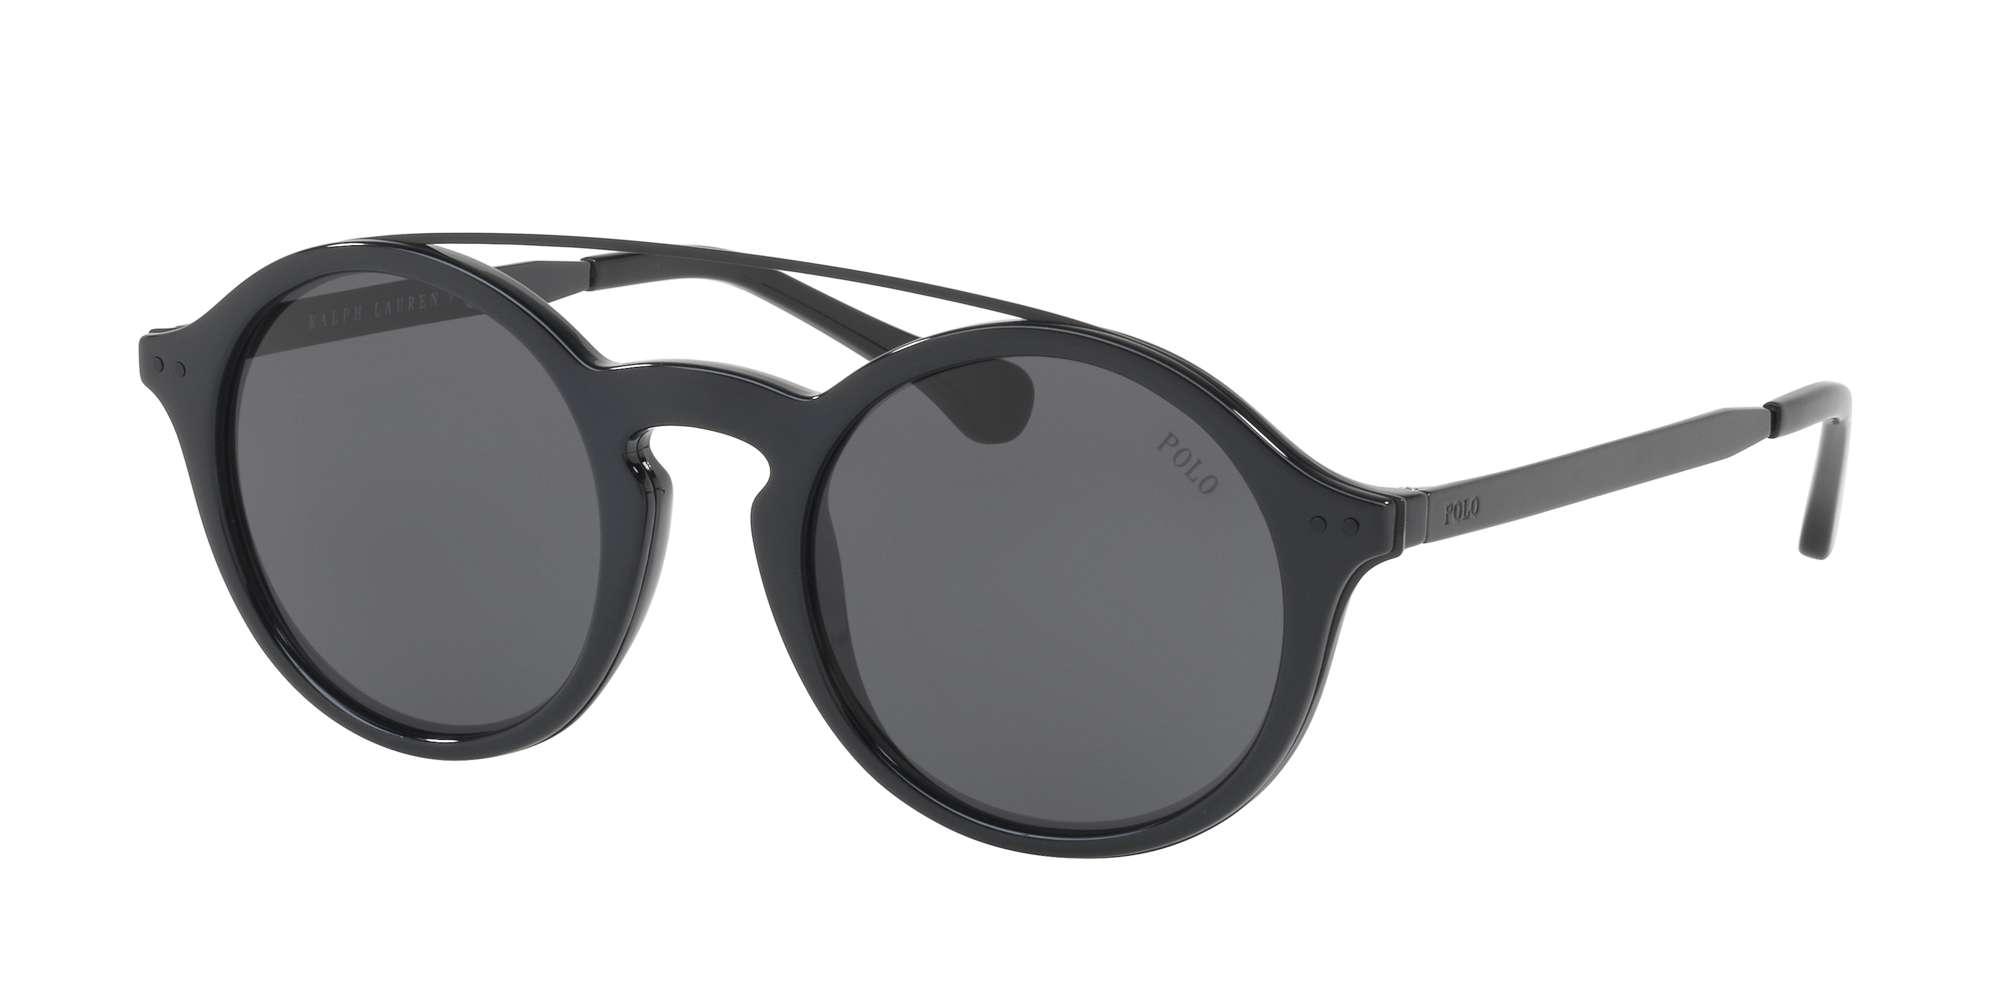 SHINY BLACK / DARK GRAY lenses